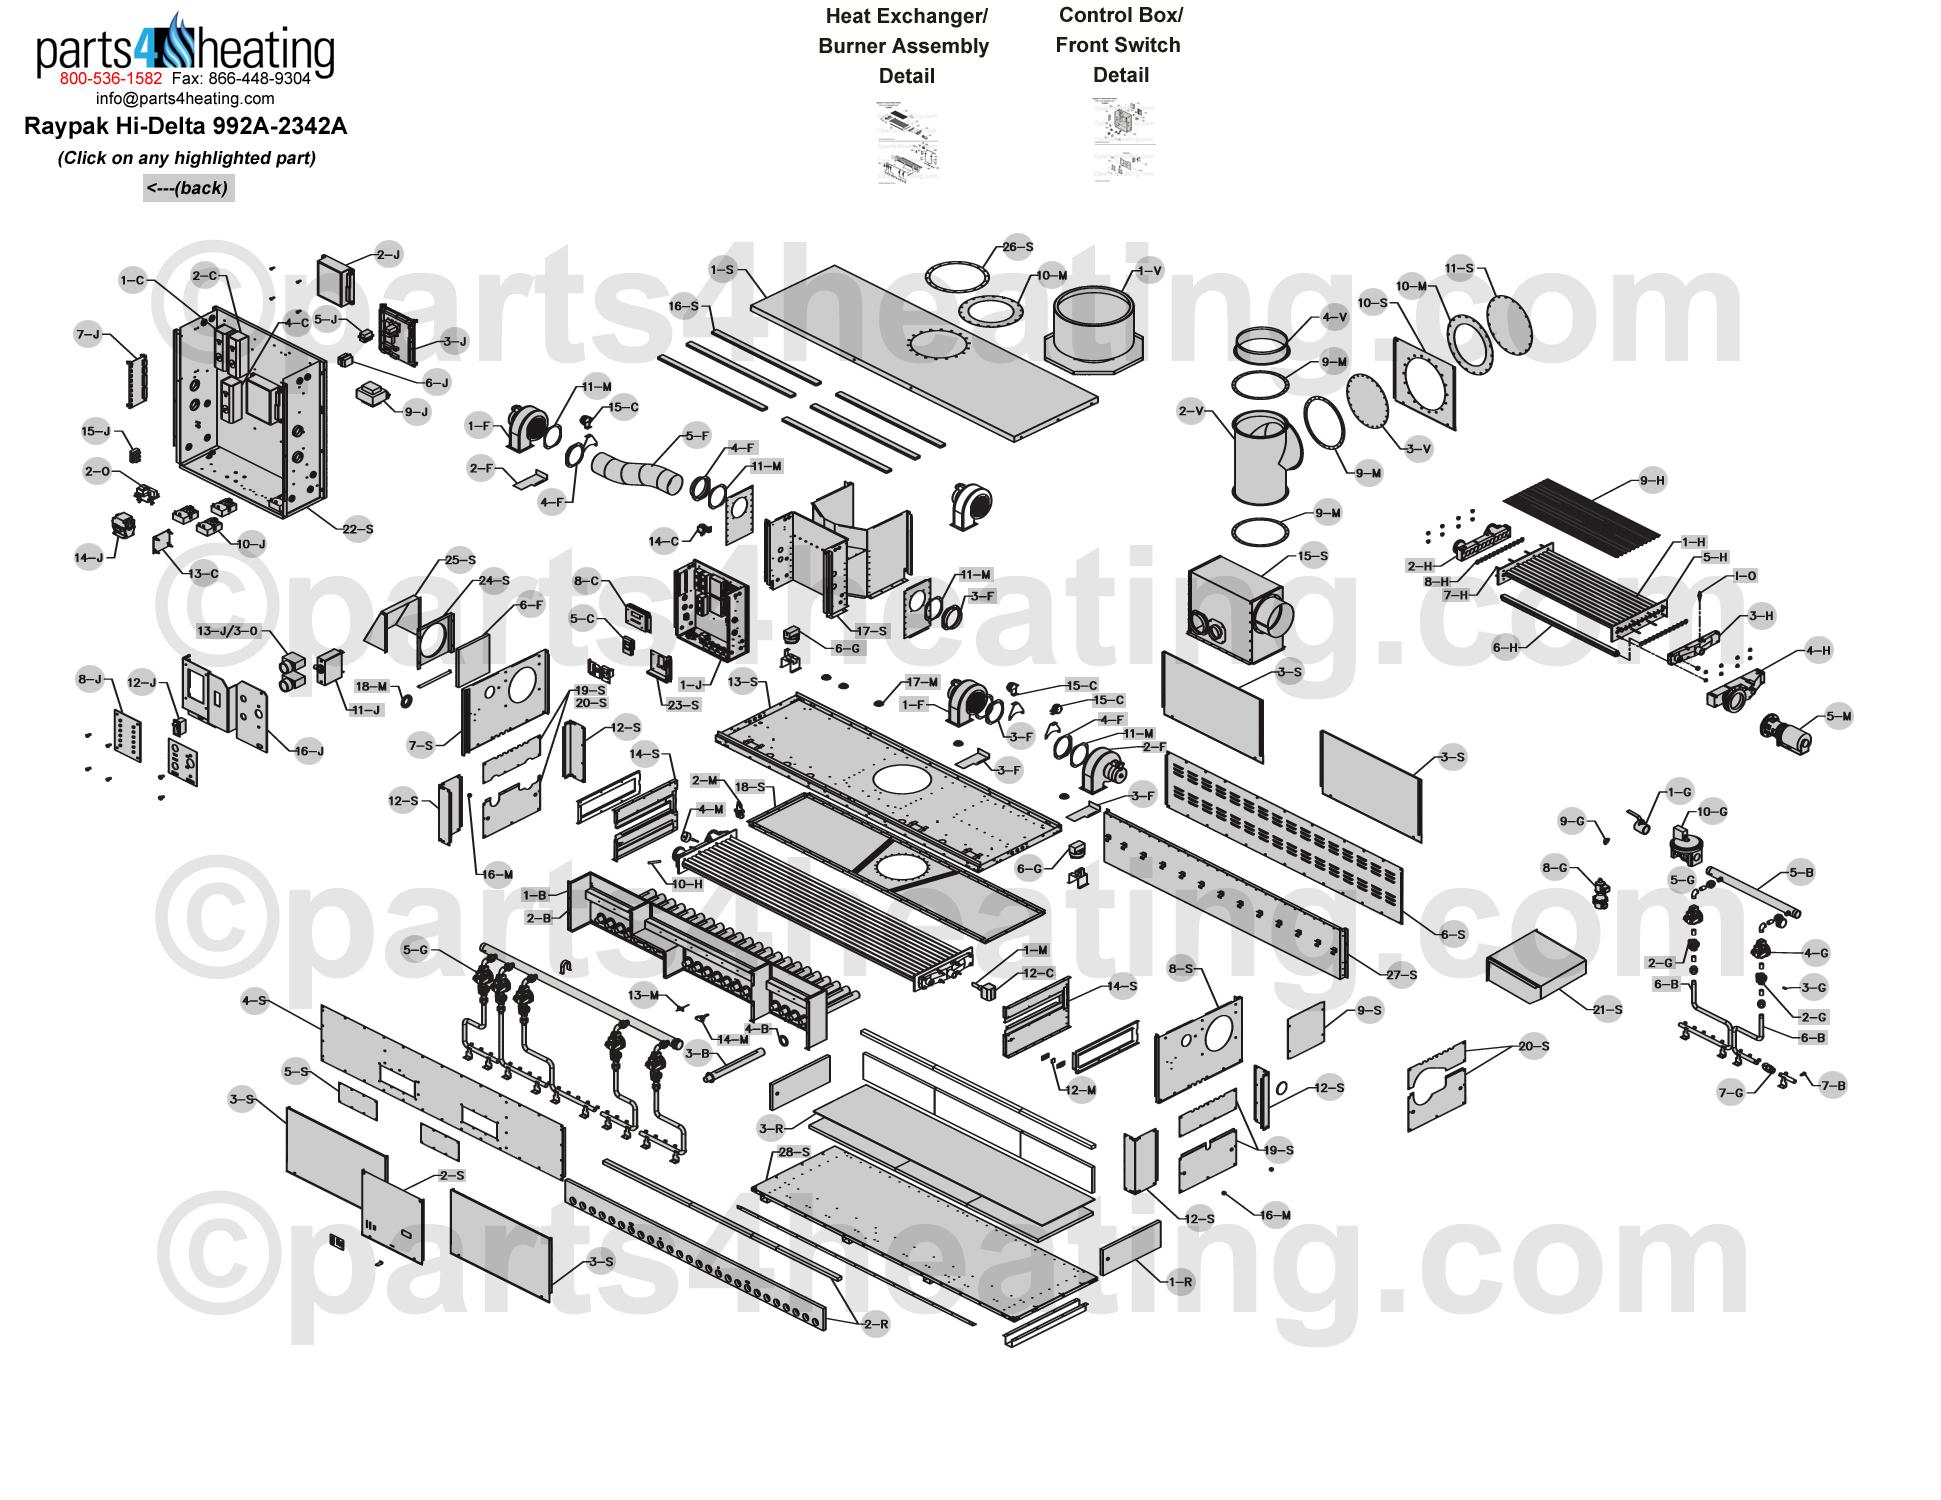 Raypak Heater Diagram Great Design Of Wiring Versa Pool Gas Rp2100 Parts